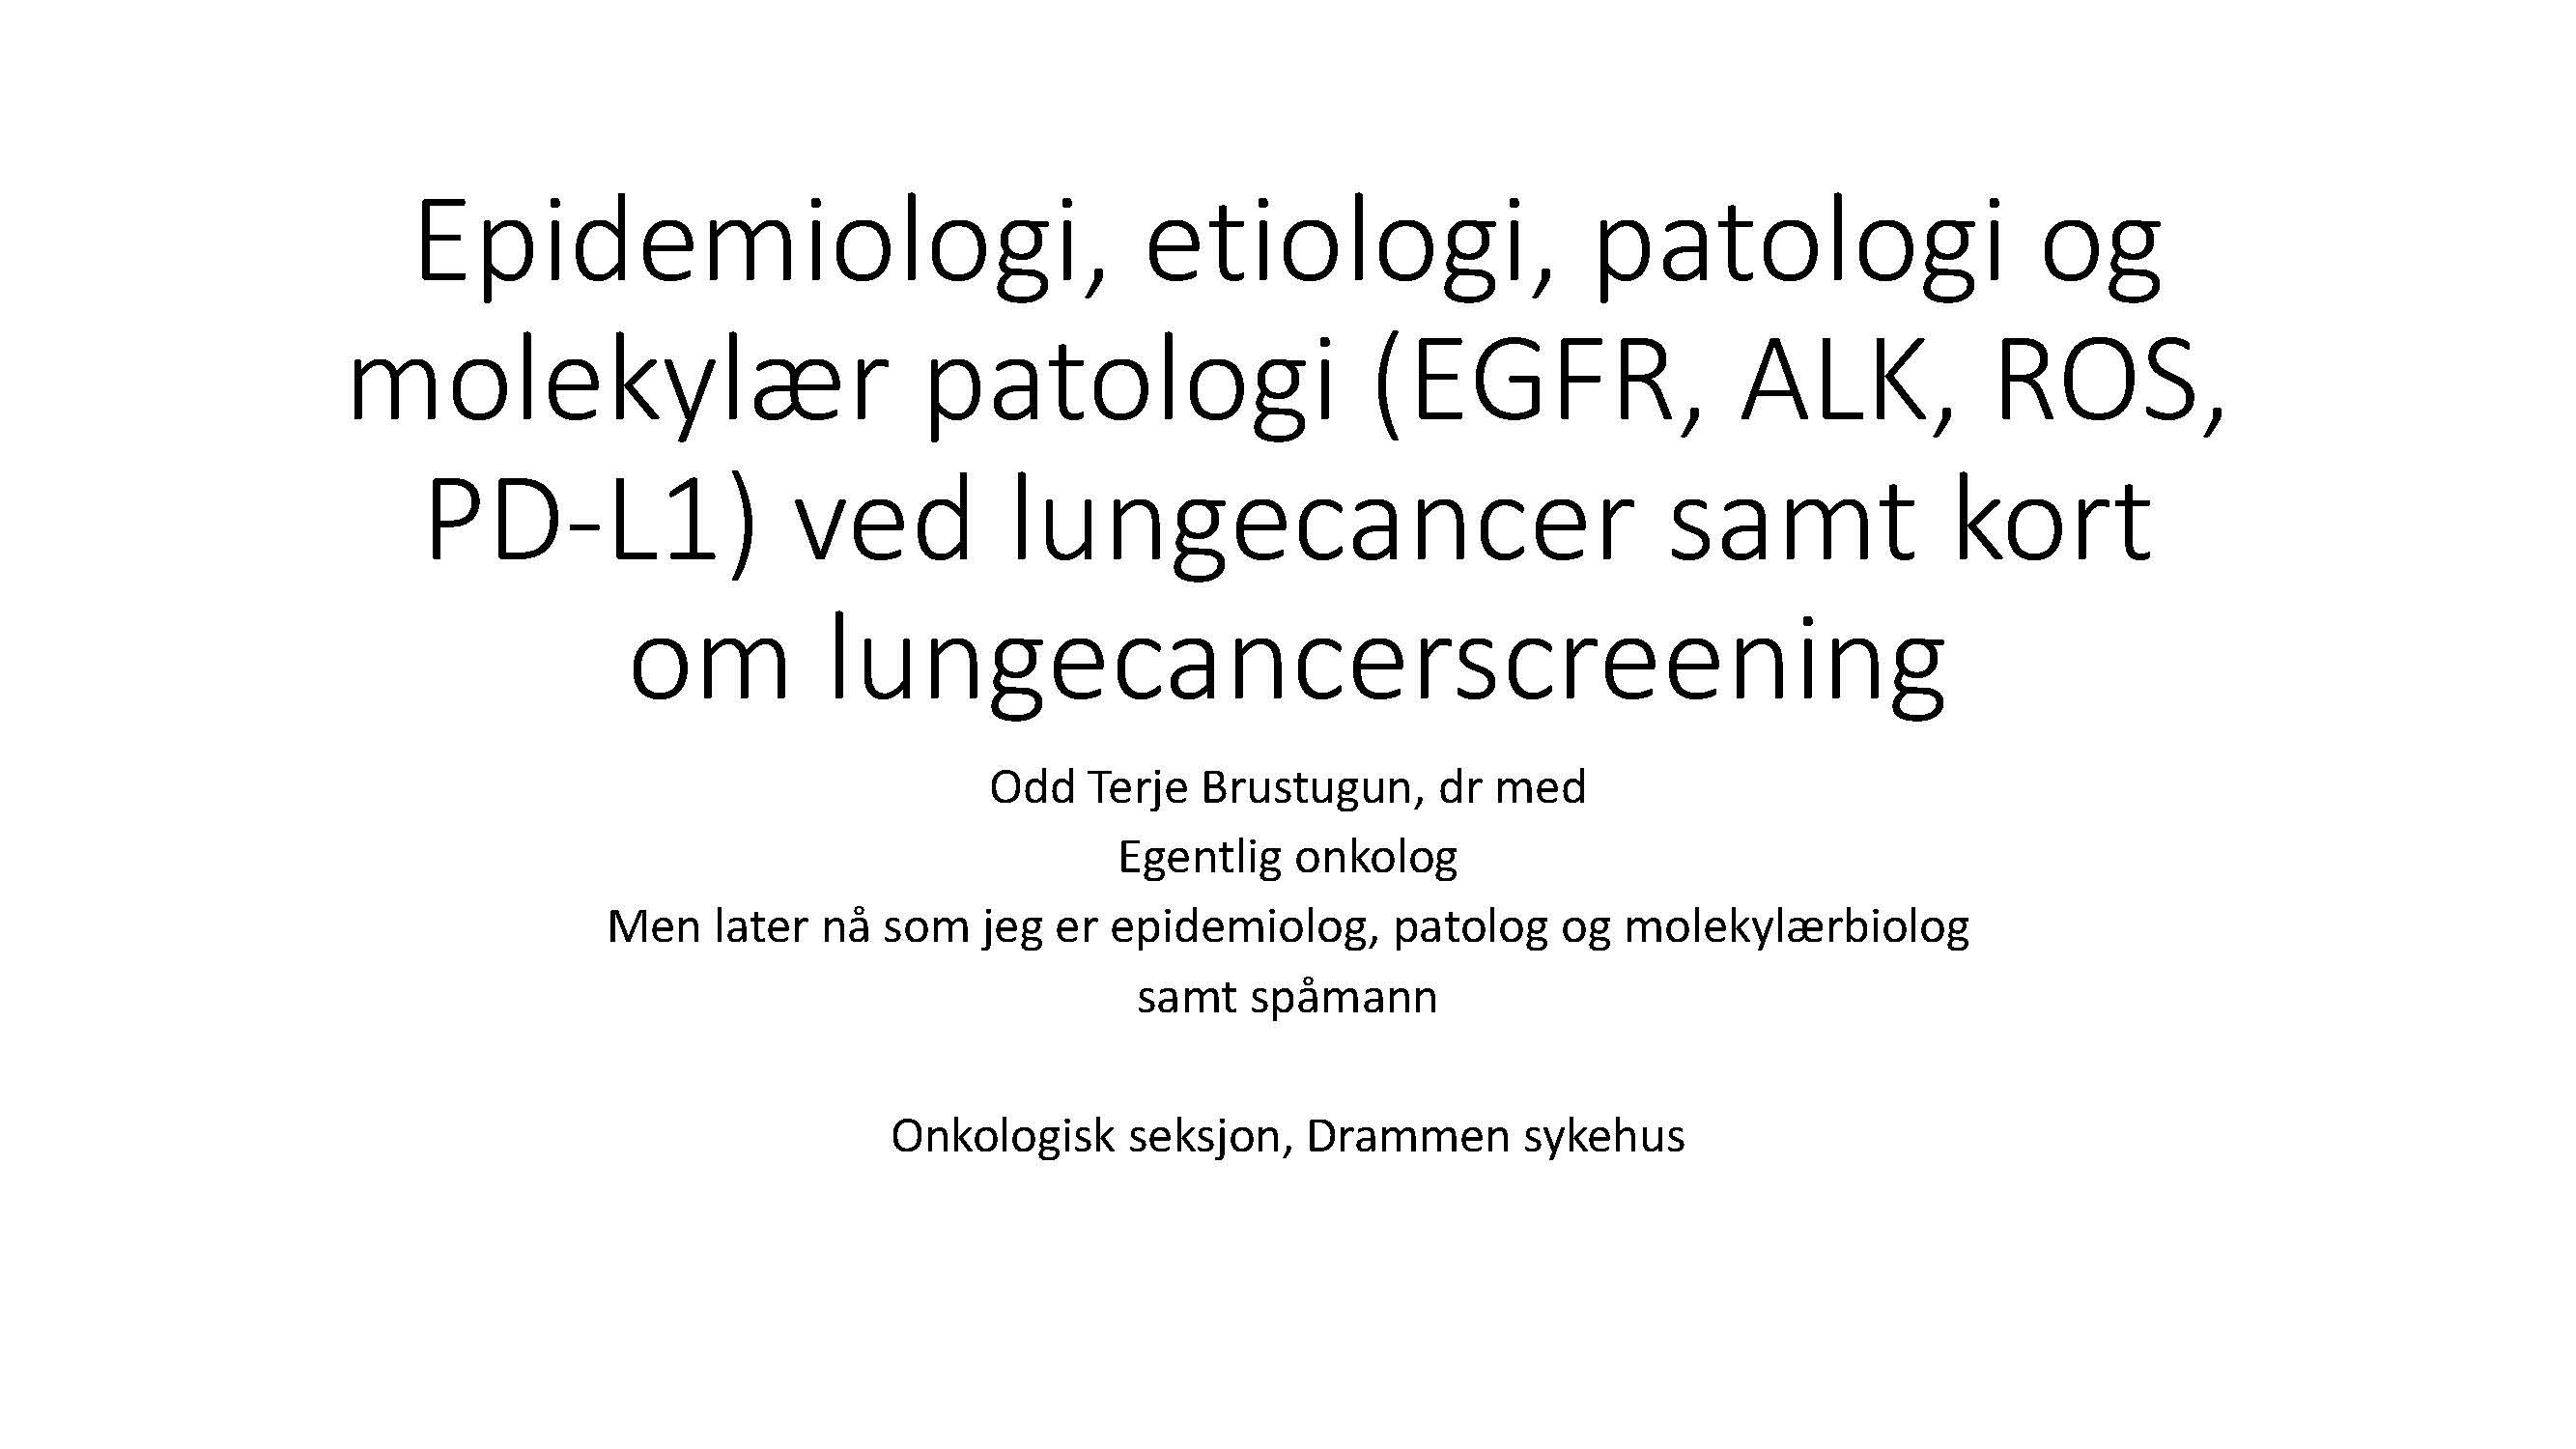 6. Epidemiologi, etiologi, patologi og molekylær patologi (EGFR, ALK, ROS, PD-L1) ved lungecancer, samt kort om lungecancer screening, Odd Terje Brustugun